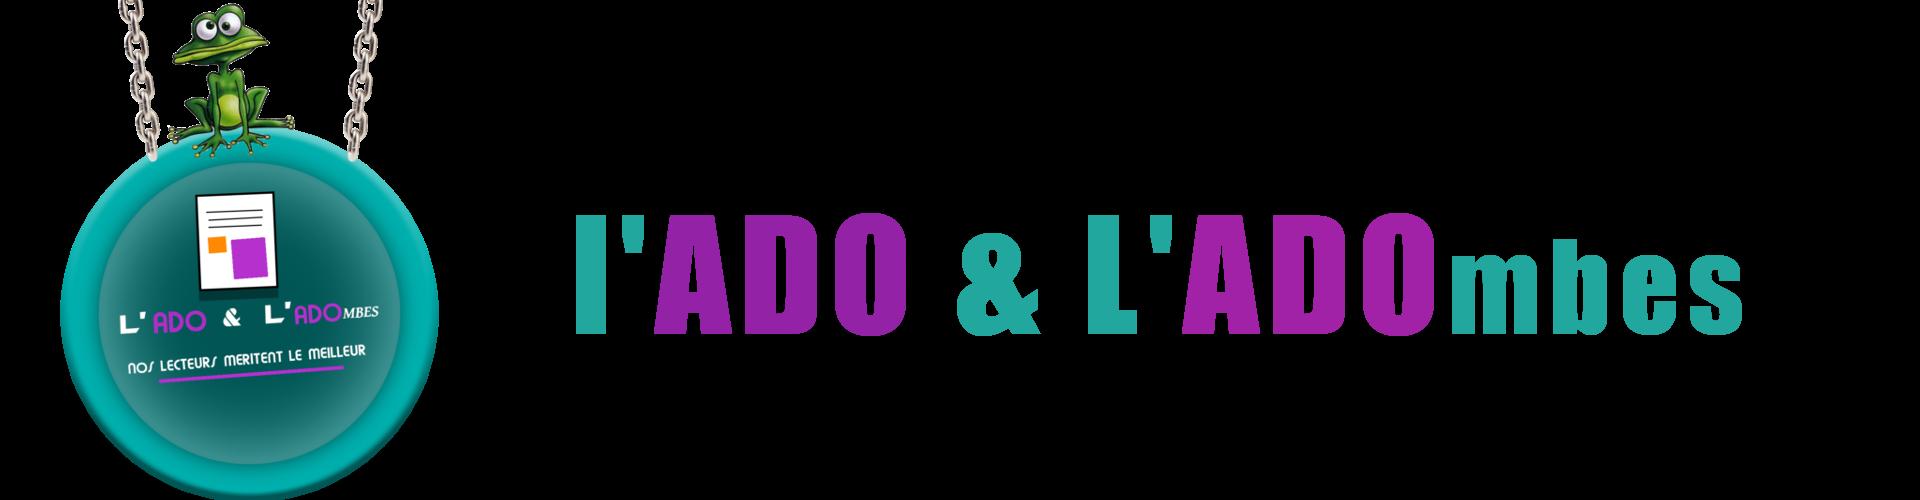 L'ADO & L'ADOmbes